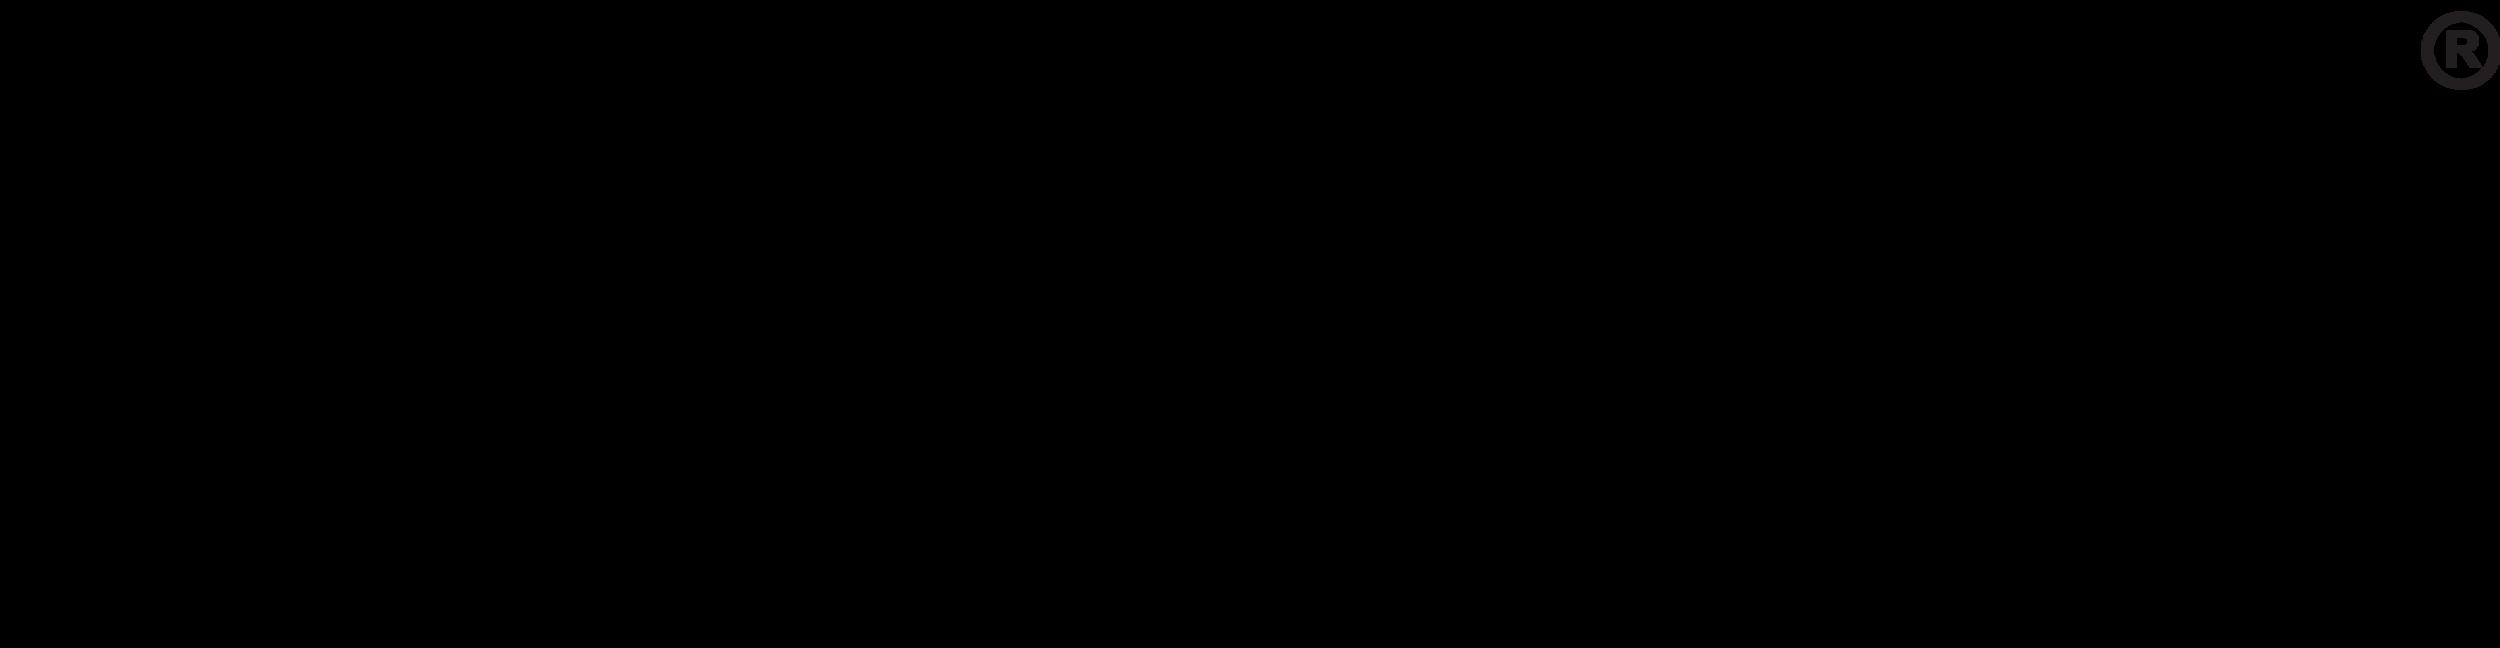 SKOTKA Vodka Logo Black